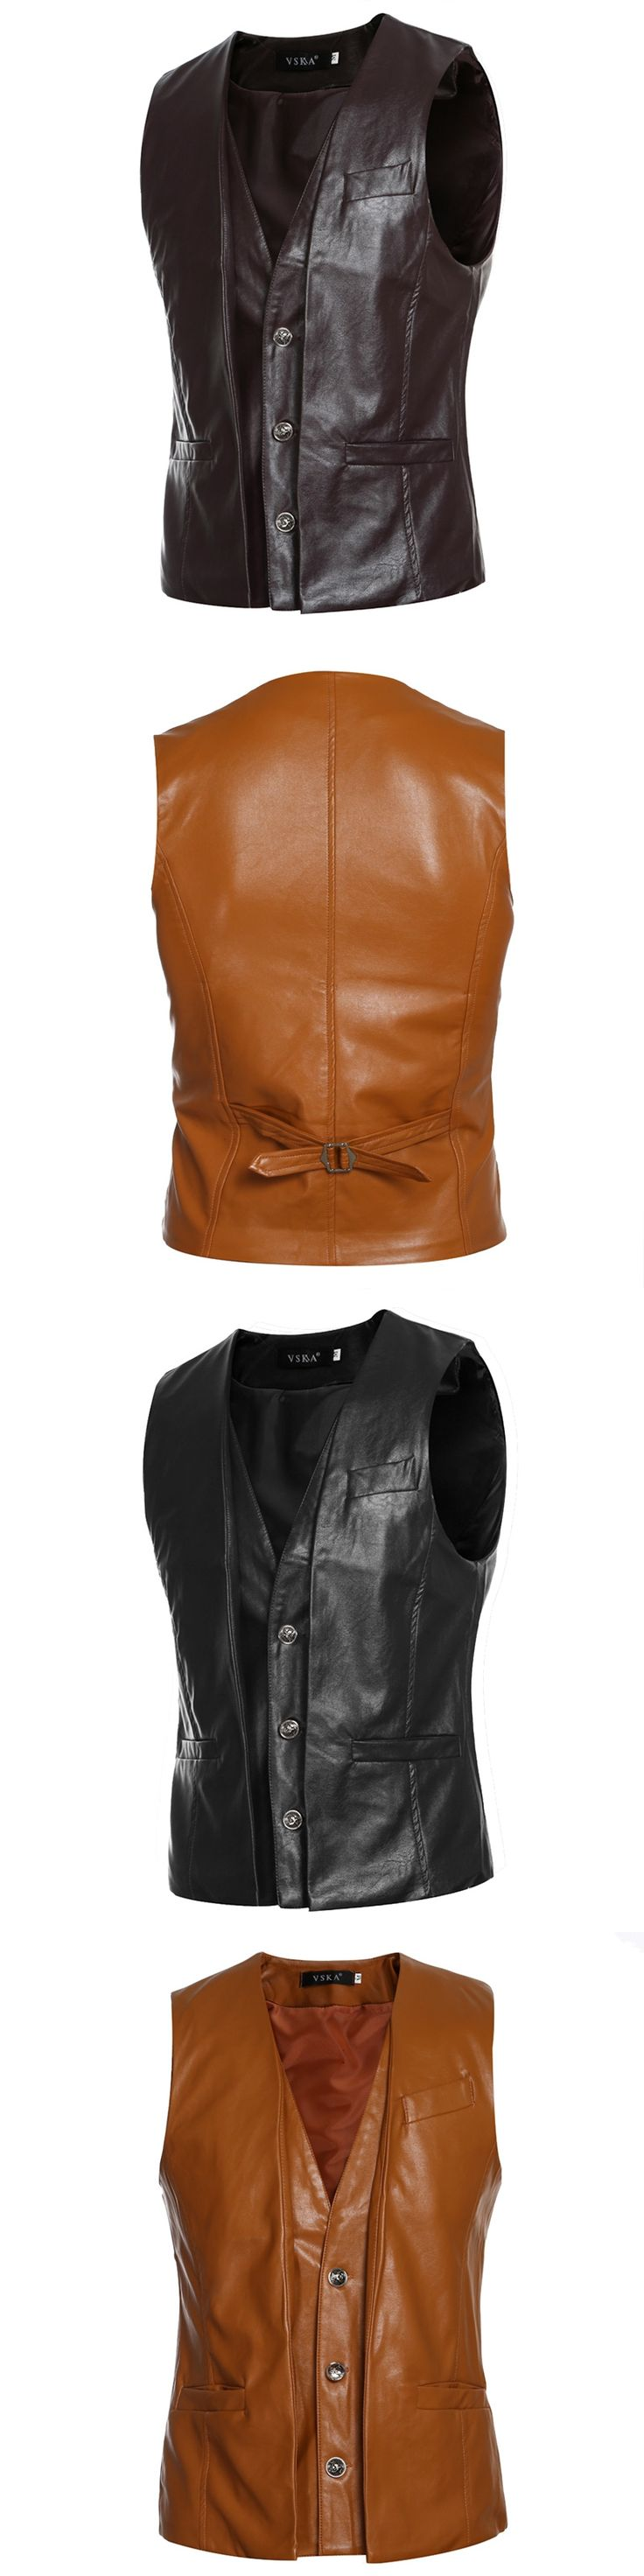 6 styles Men's PU Vests 2017 New Arrival Brand Men Sleeveless Jacket Male Casual PU Leather Vest Slim Men's Vest Waistcoat MQ489